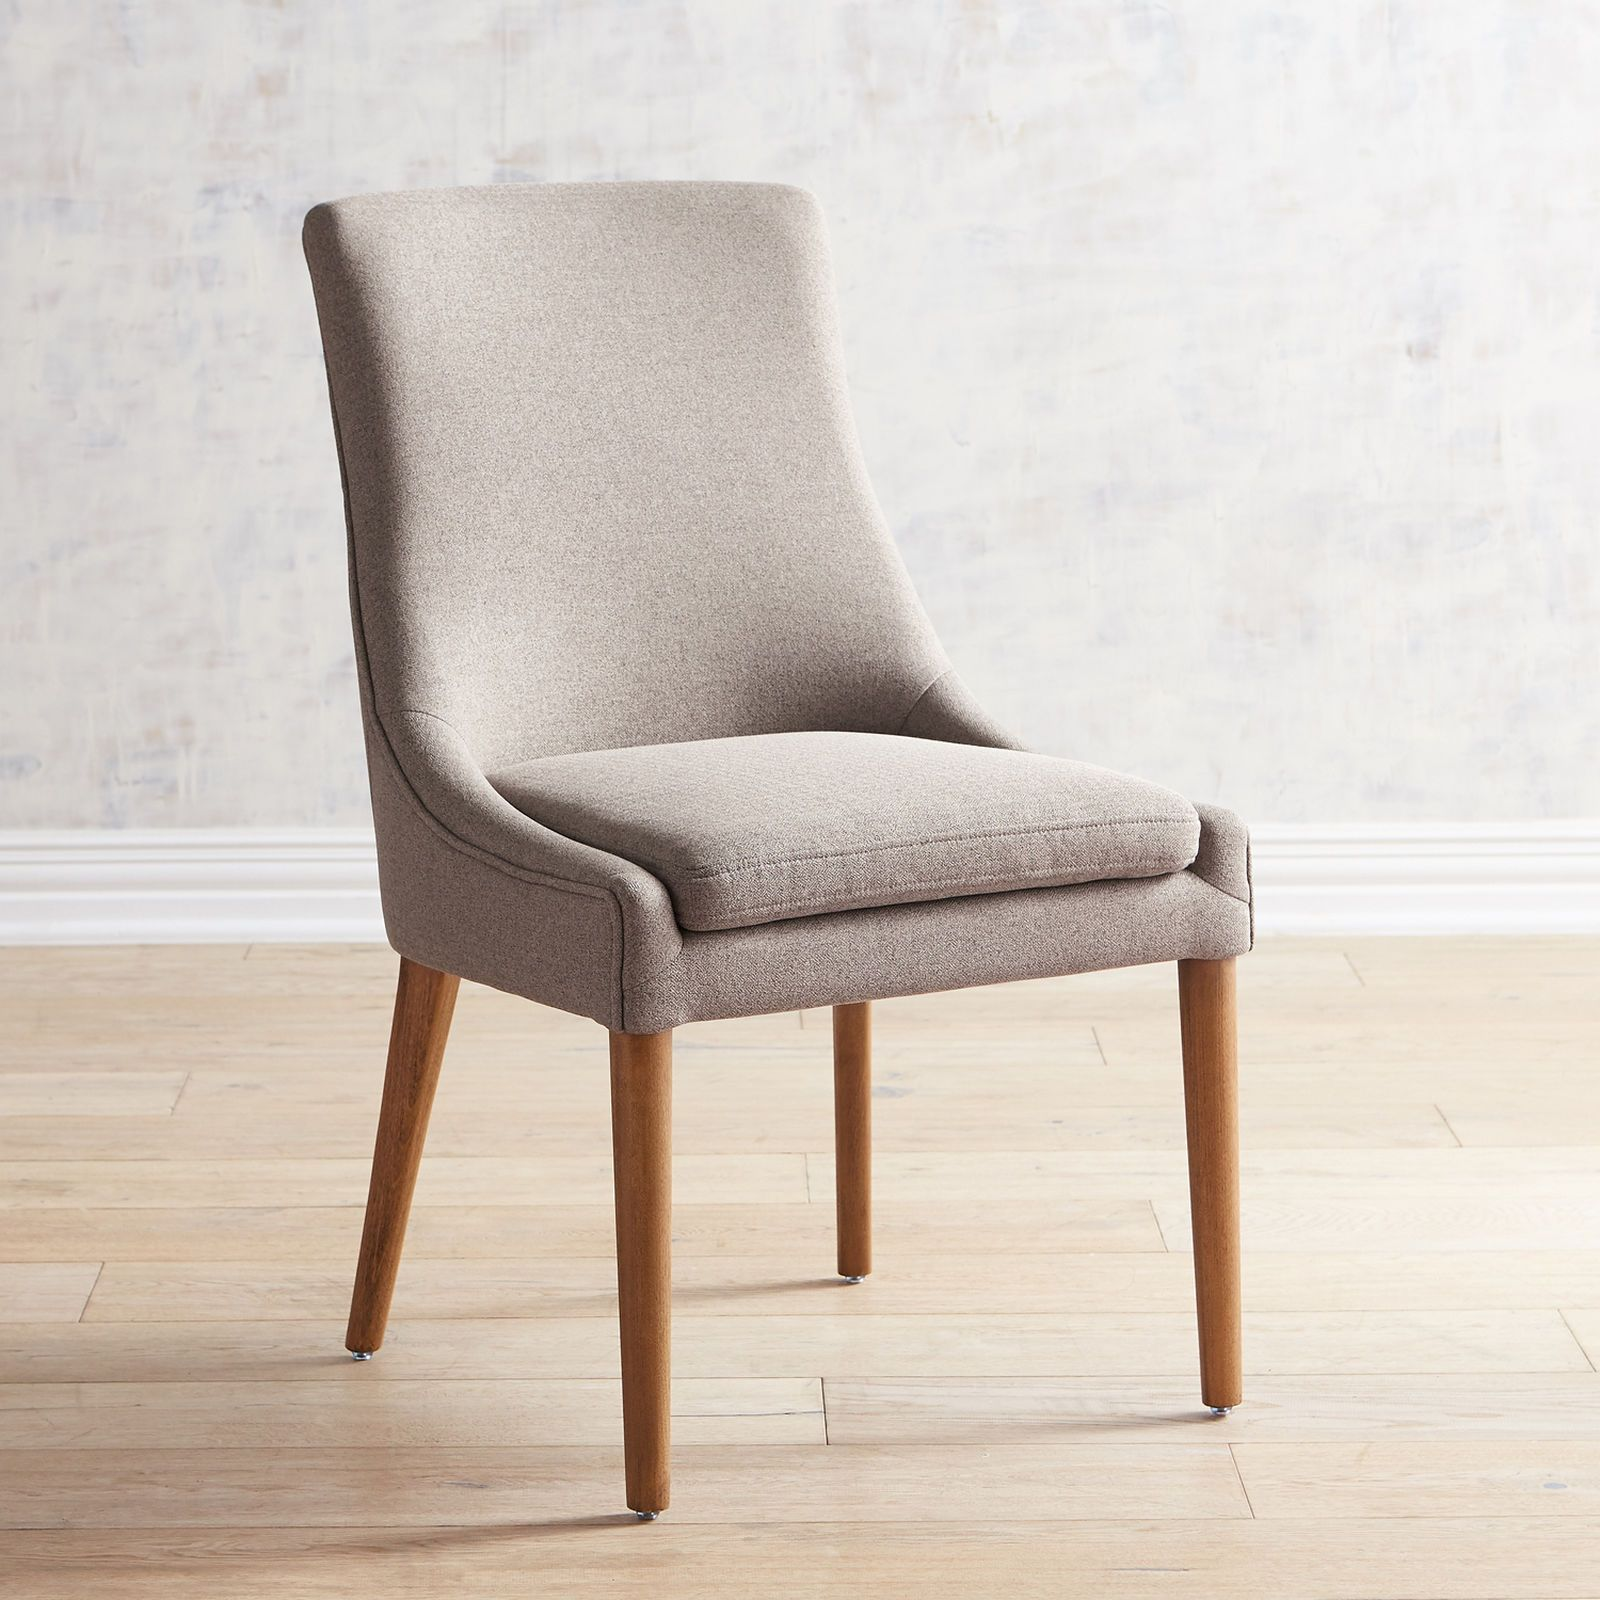 Enjoyable Darrin Taupe Dining Chair With Java Wood Boho Modern Short Links Chair Design For Home Short Linksinfo